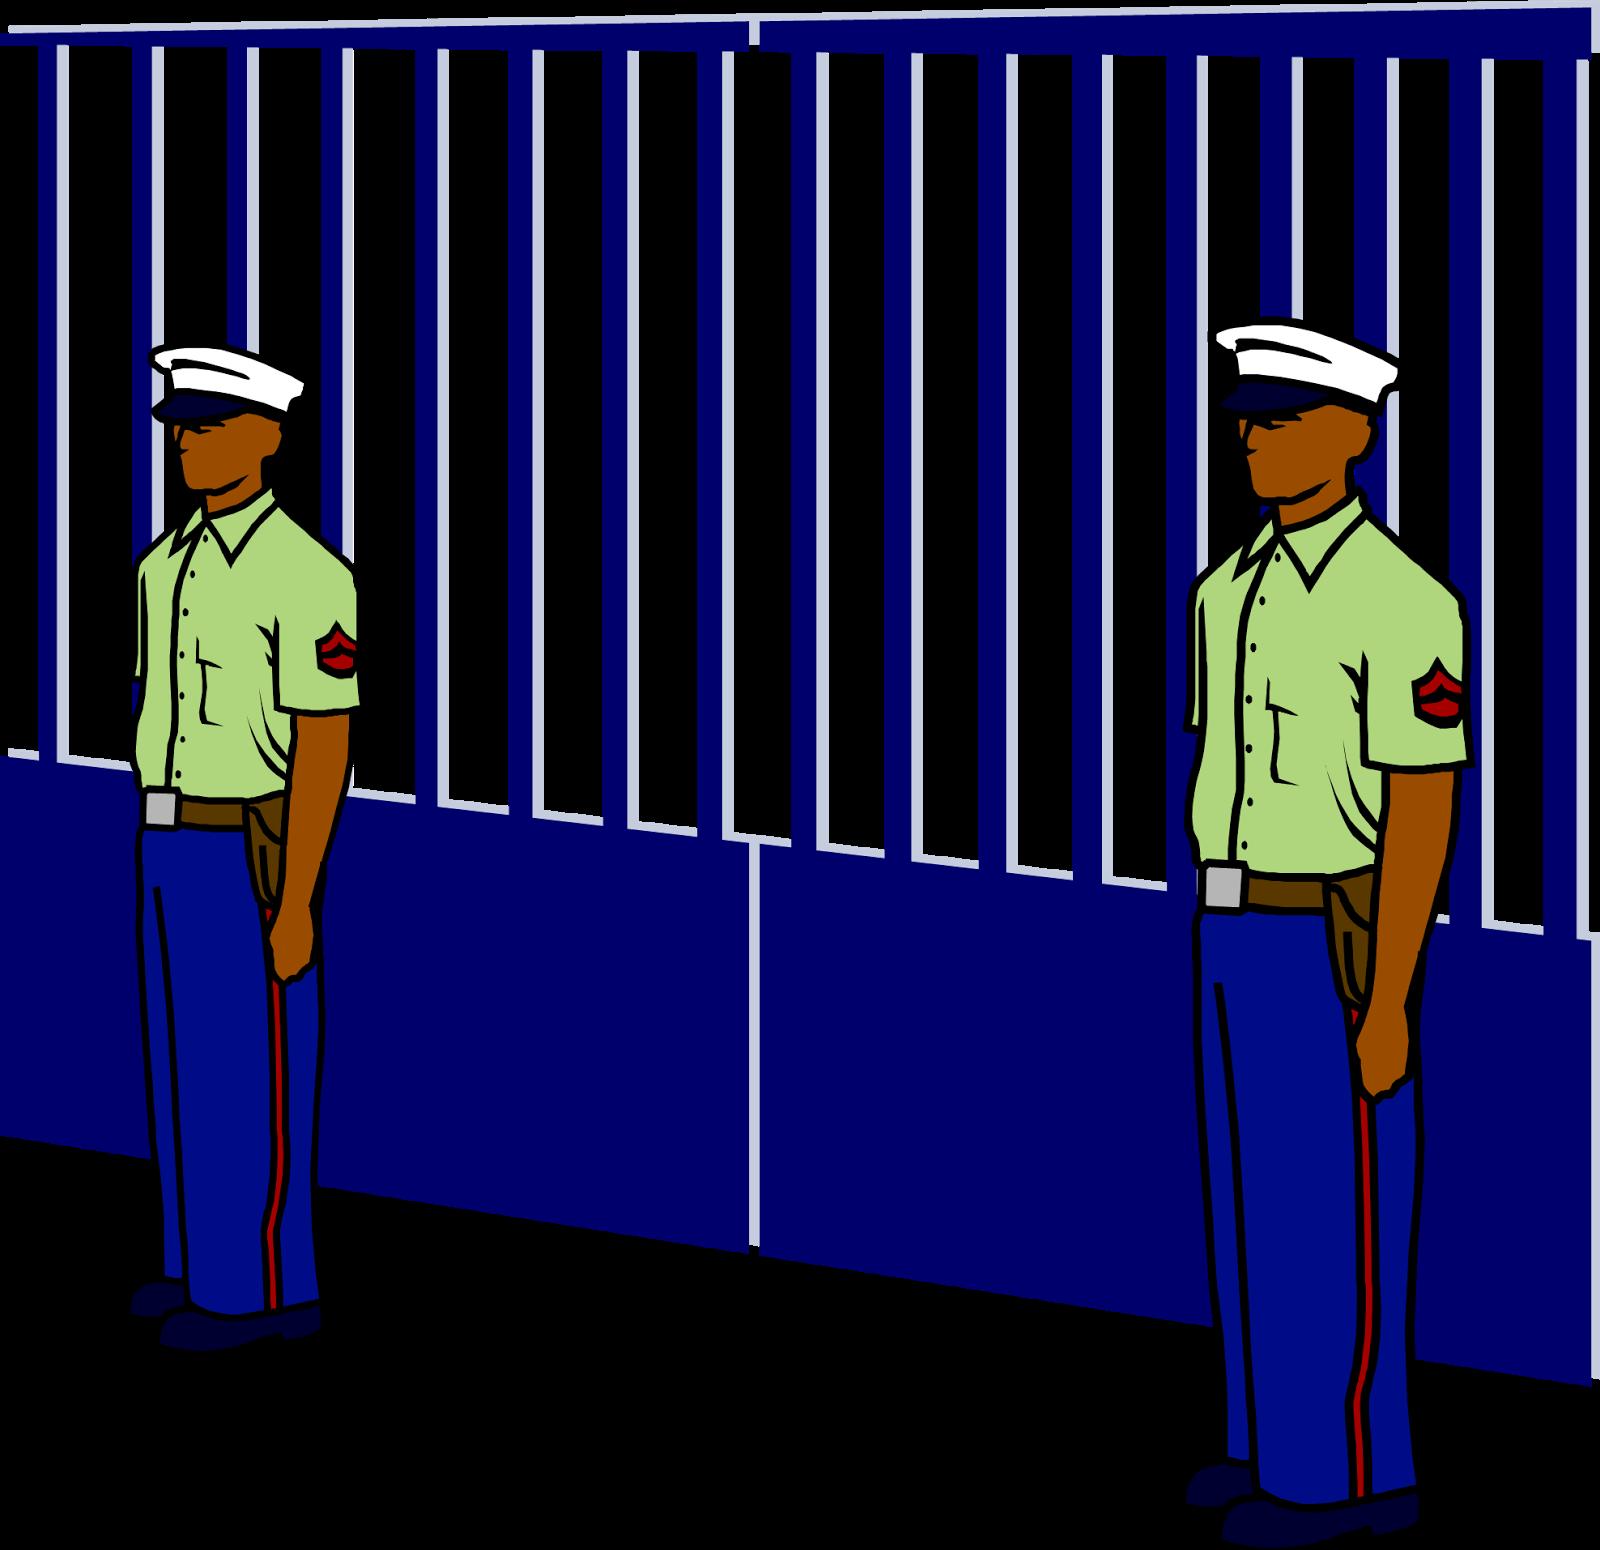 Gate Keeper clipart 2013 Missions: Tanzanian GATEKEEPER THE